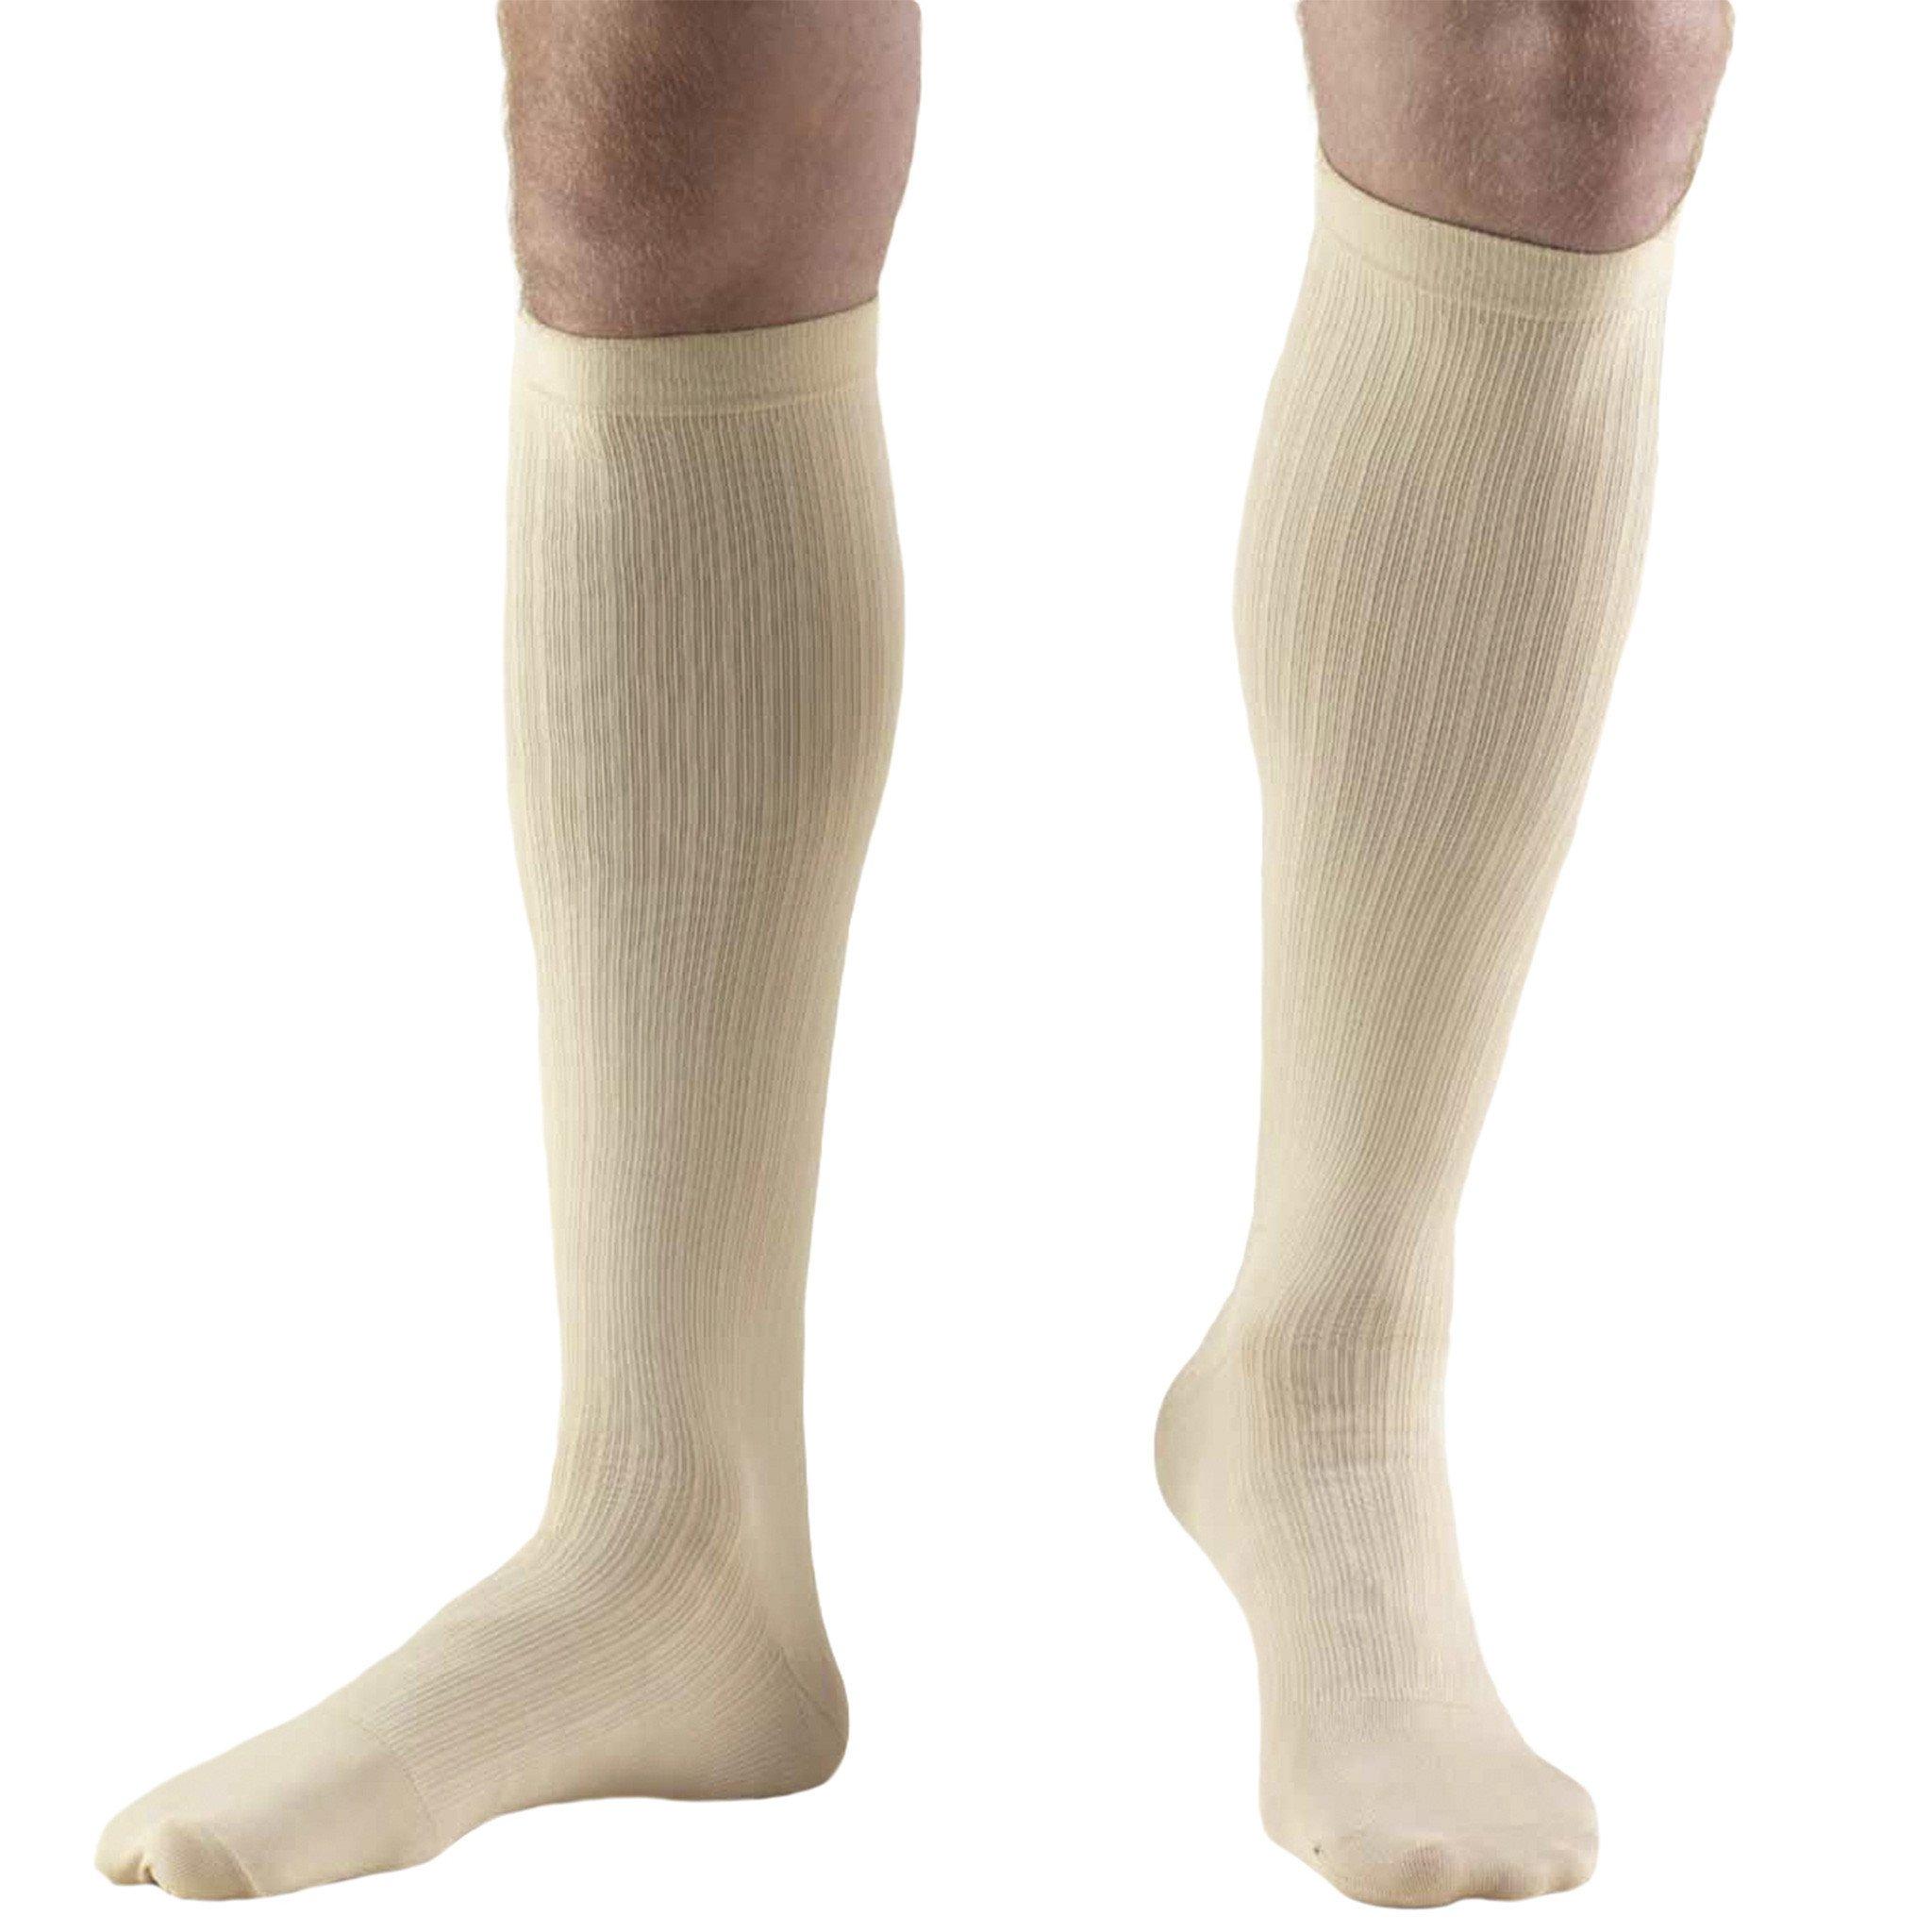 Truform Compression Socks, 8-15 mmHg, Mens Dress Socks, Knee High Over